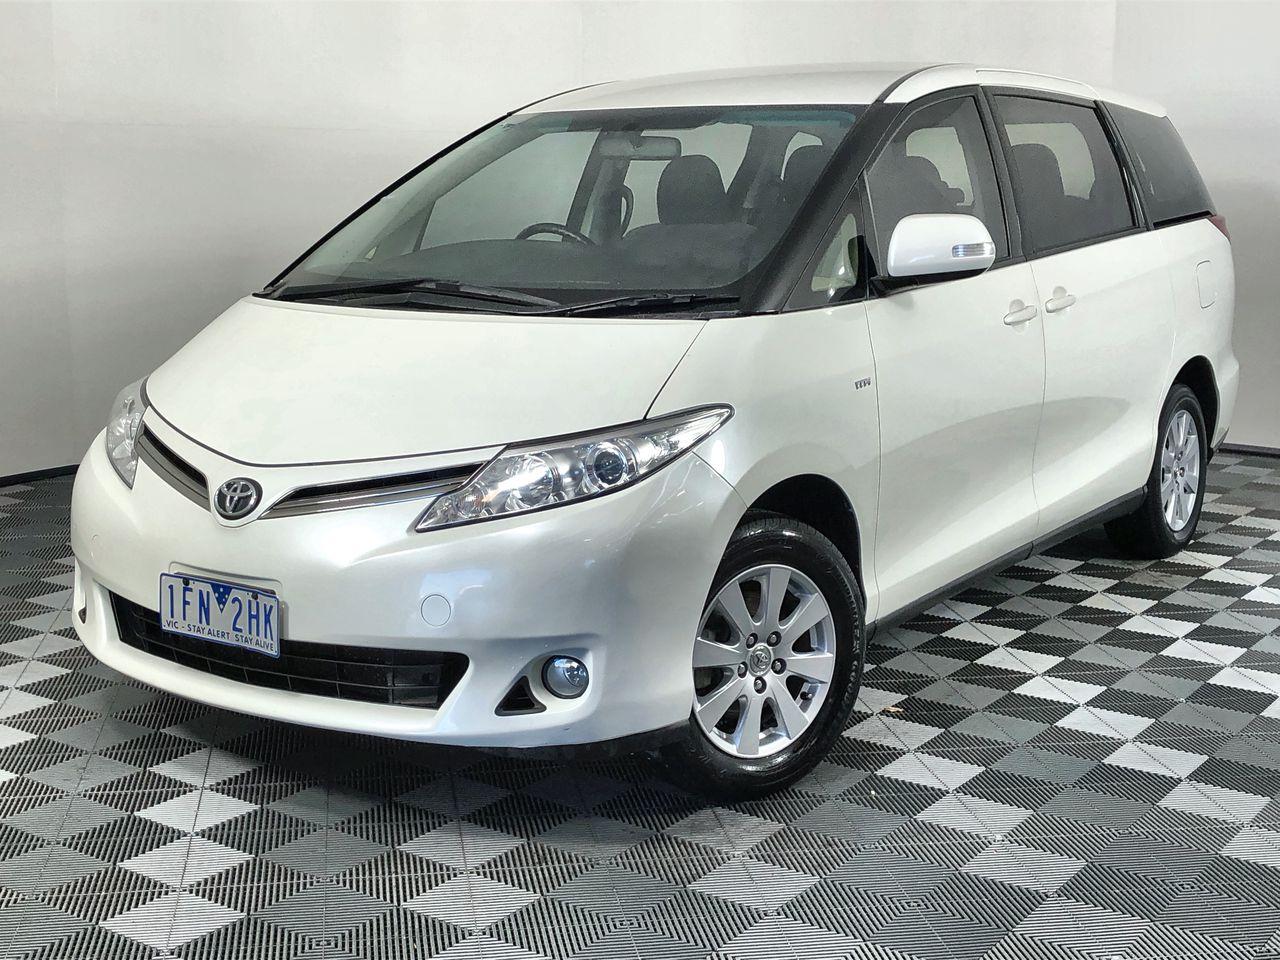 2013 Toyota Tarago GLI ACR50R CVT 8 Seats People Mover (WOVR-Inspected)